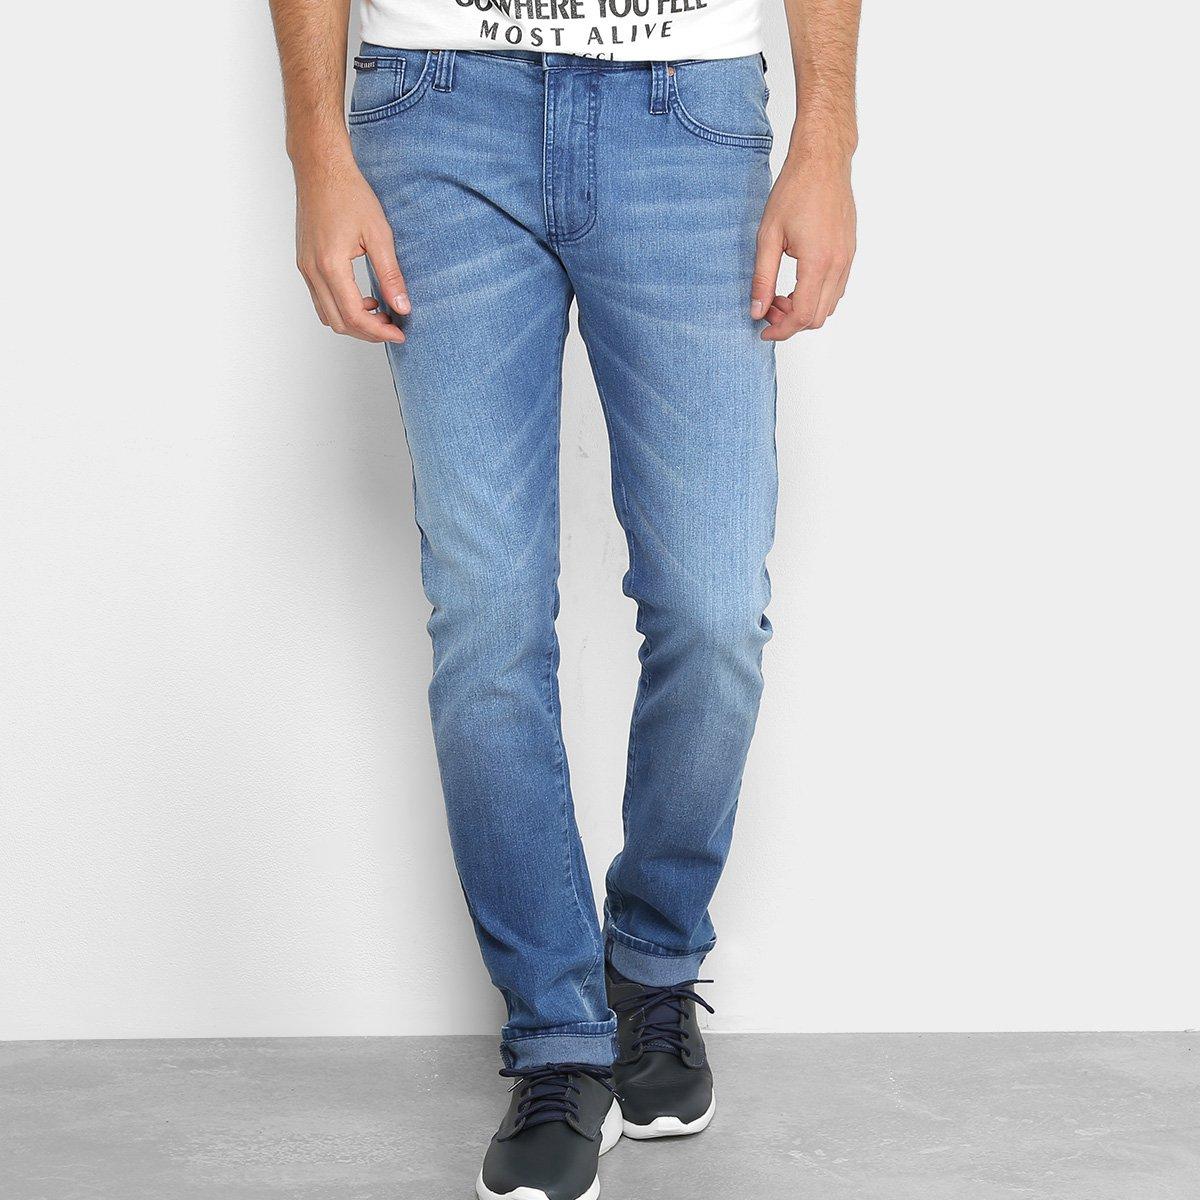 30295fba1 Calça Jeans Skinny Colcci Felipe Masculina - Compre Agora | Netshoes